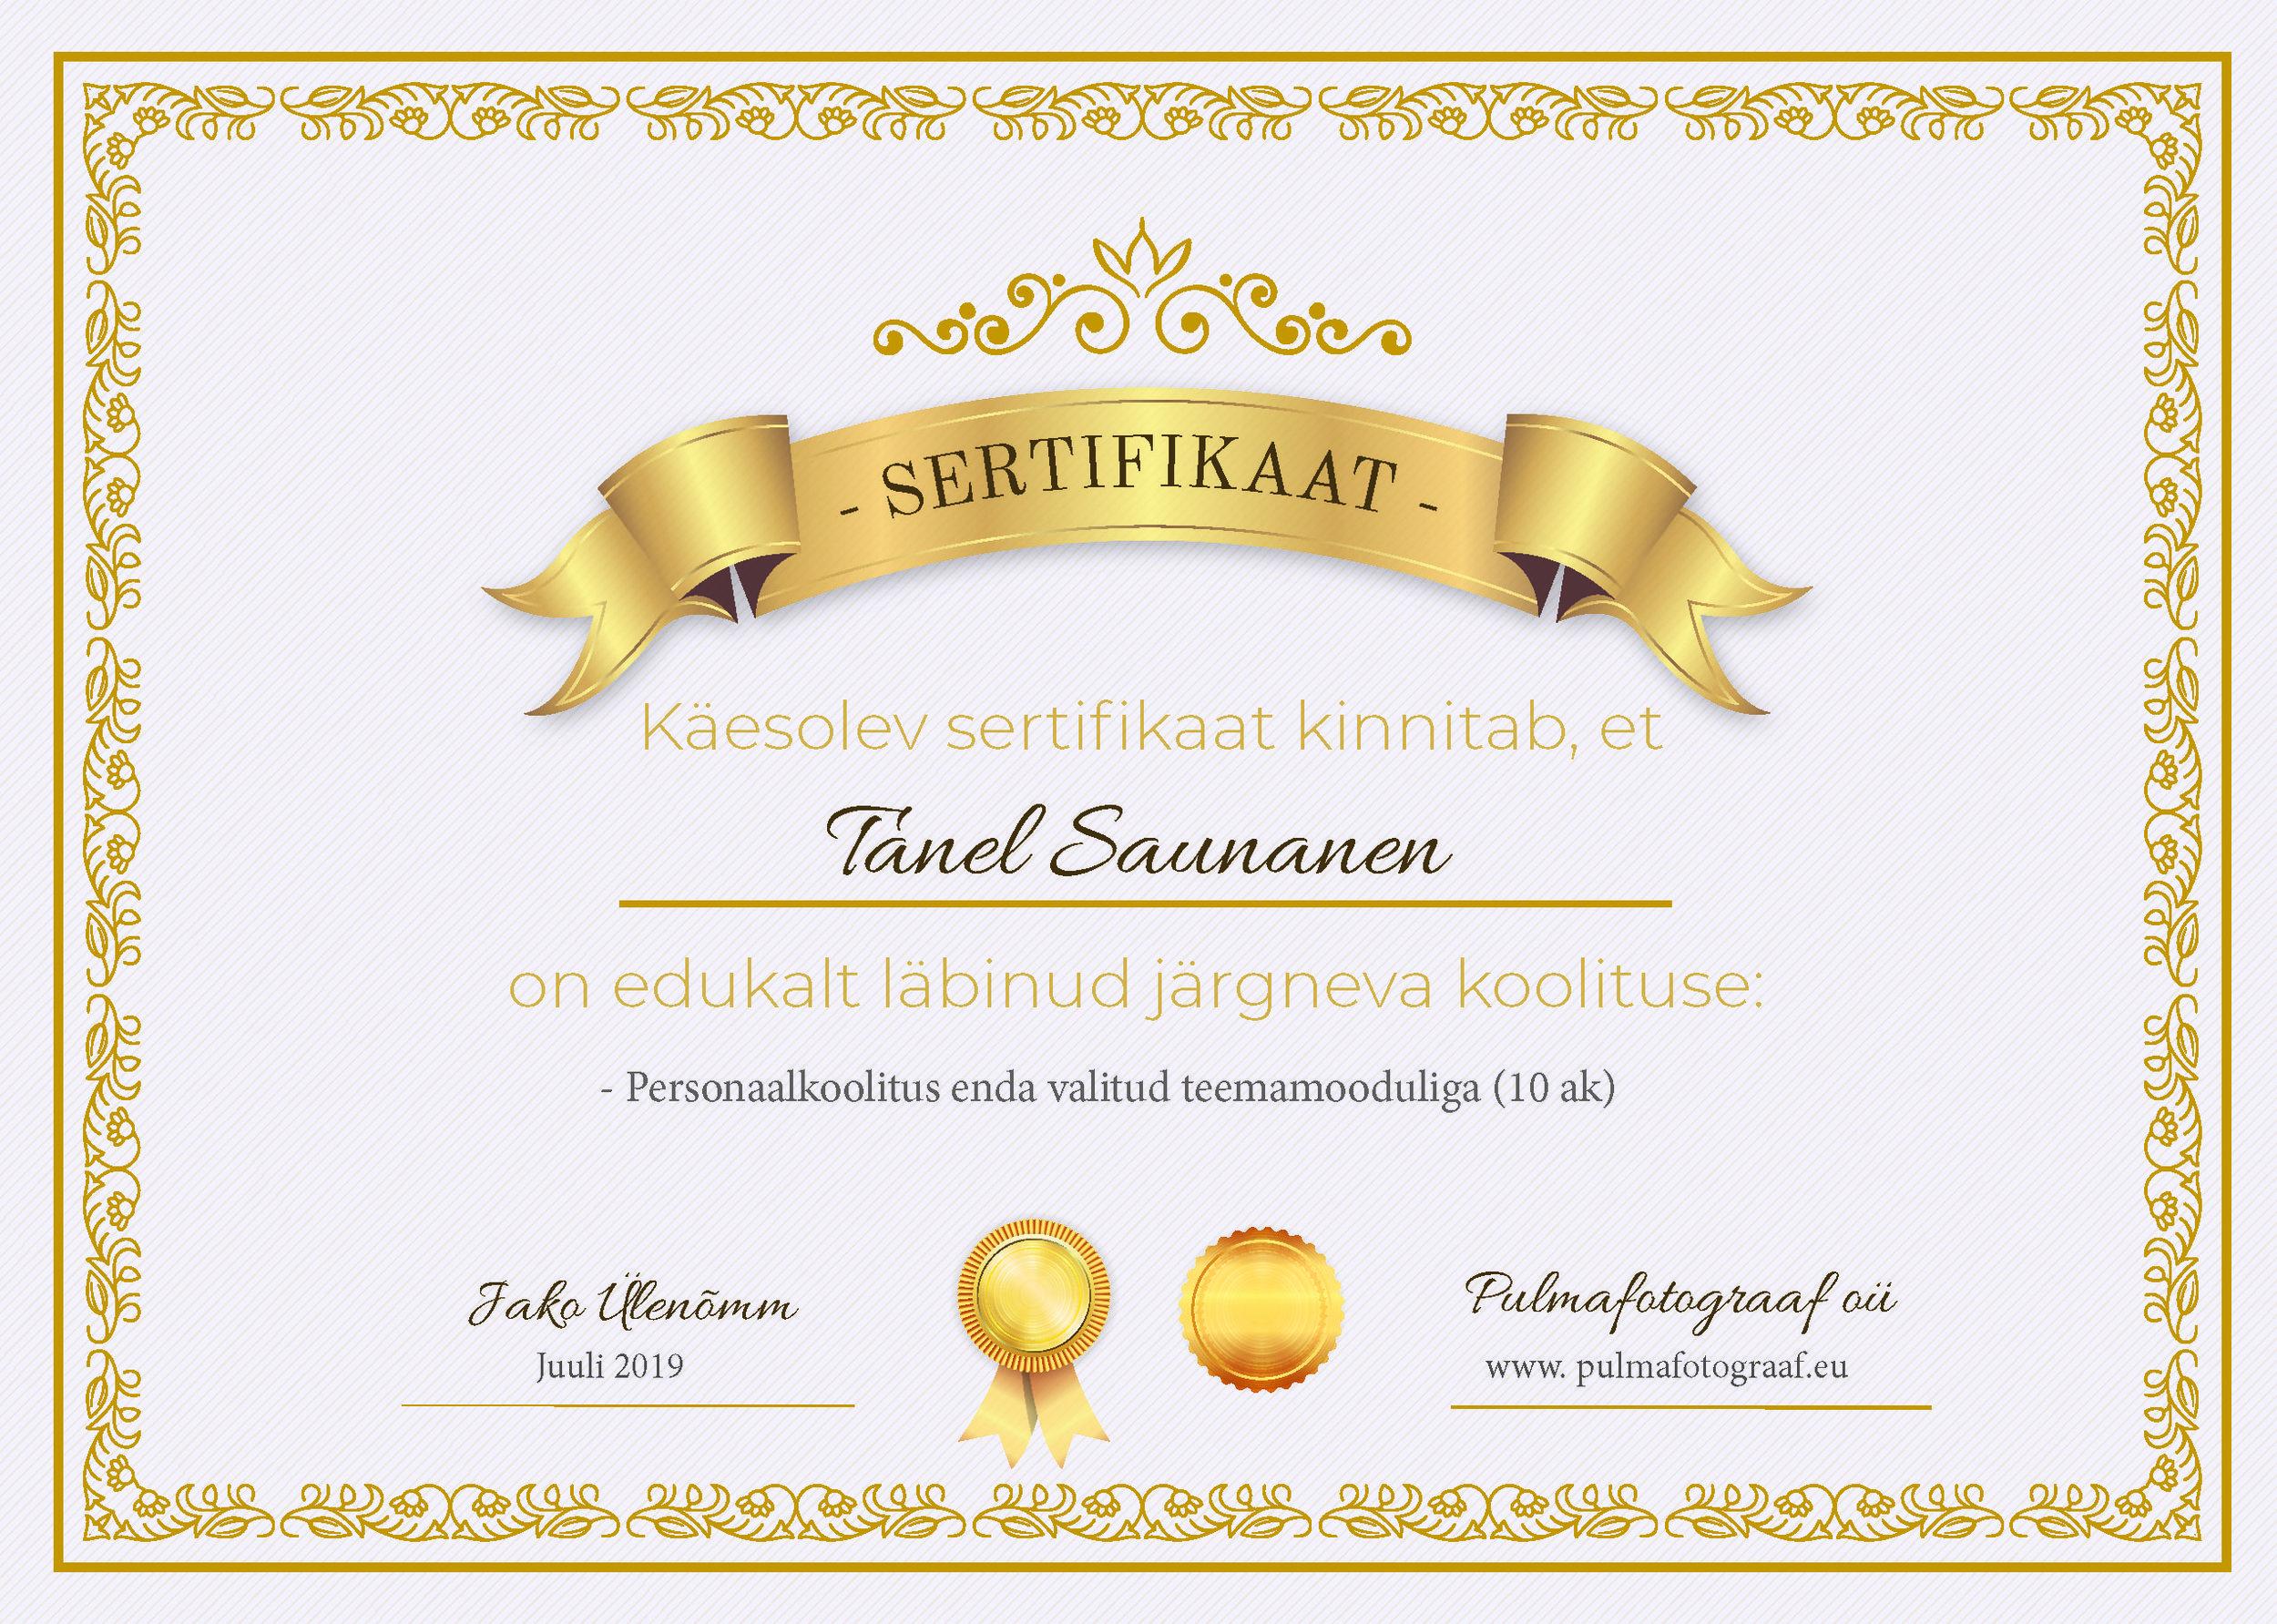 Sertifikaat_Tanel_v0.1.jpg